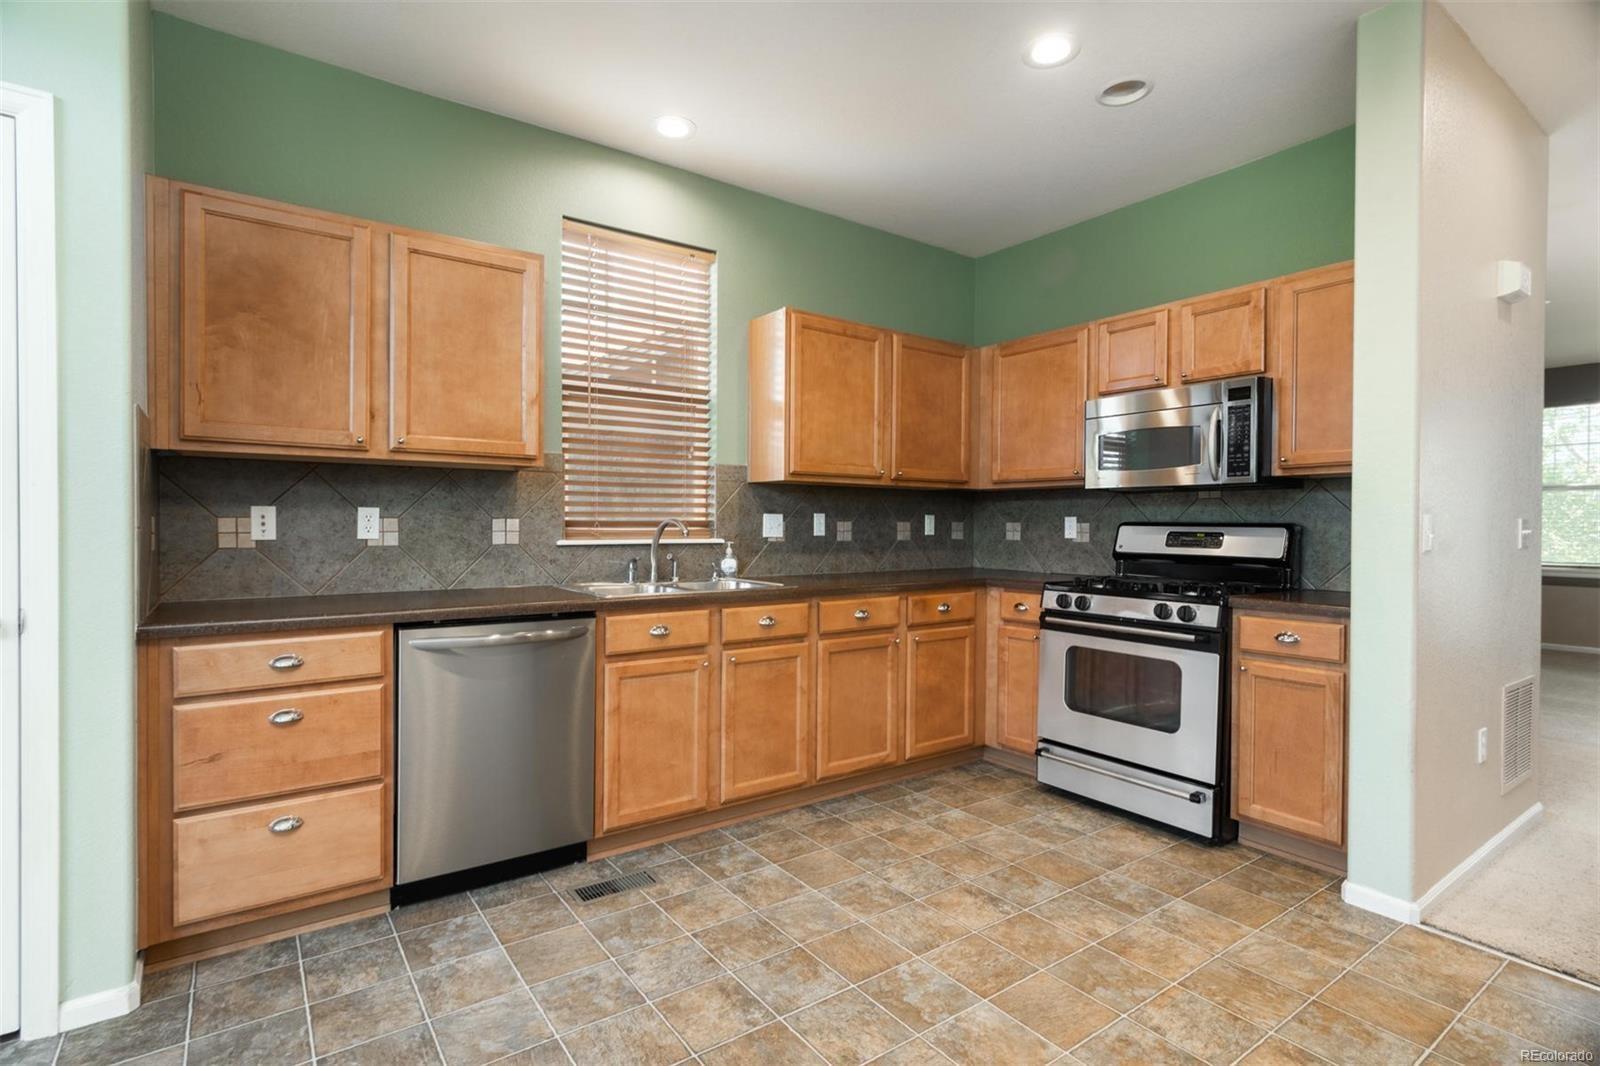 MLS# 1762805 - 1 - 5583  S Biloxi Way, Aurora, CO 80016